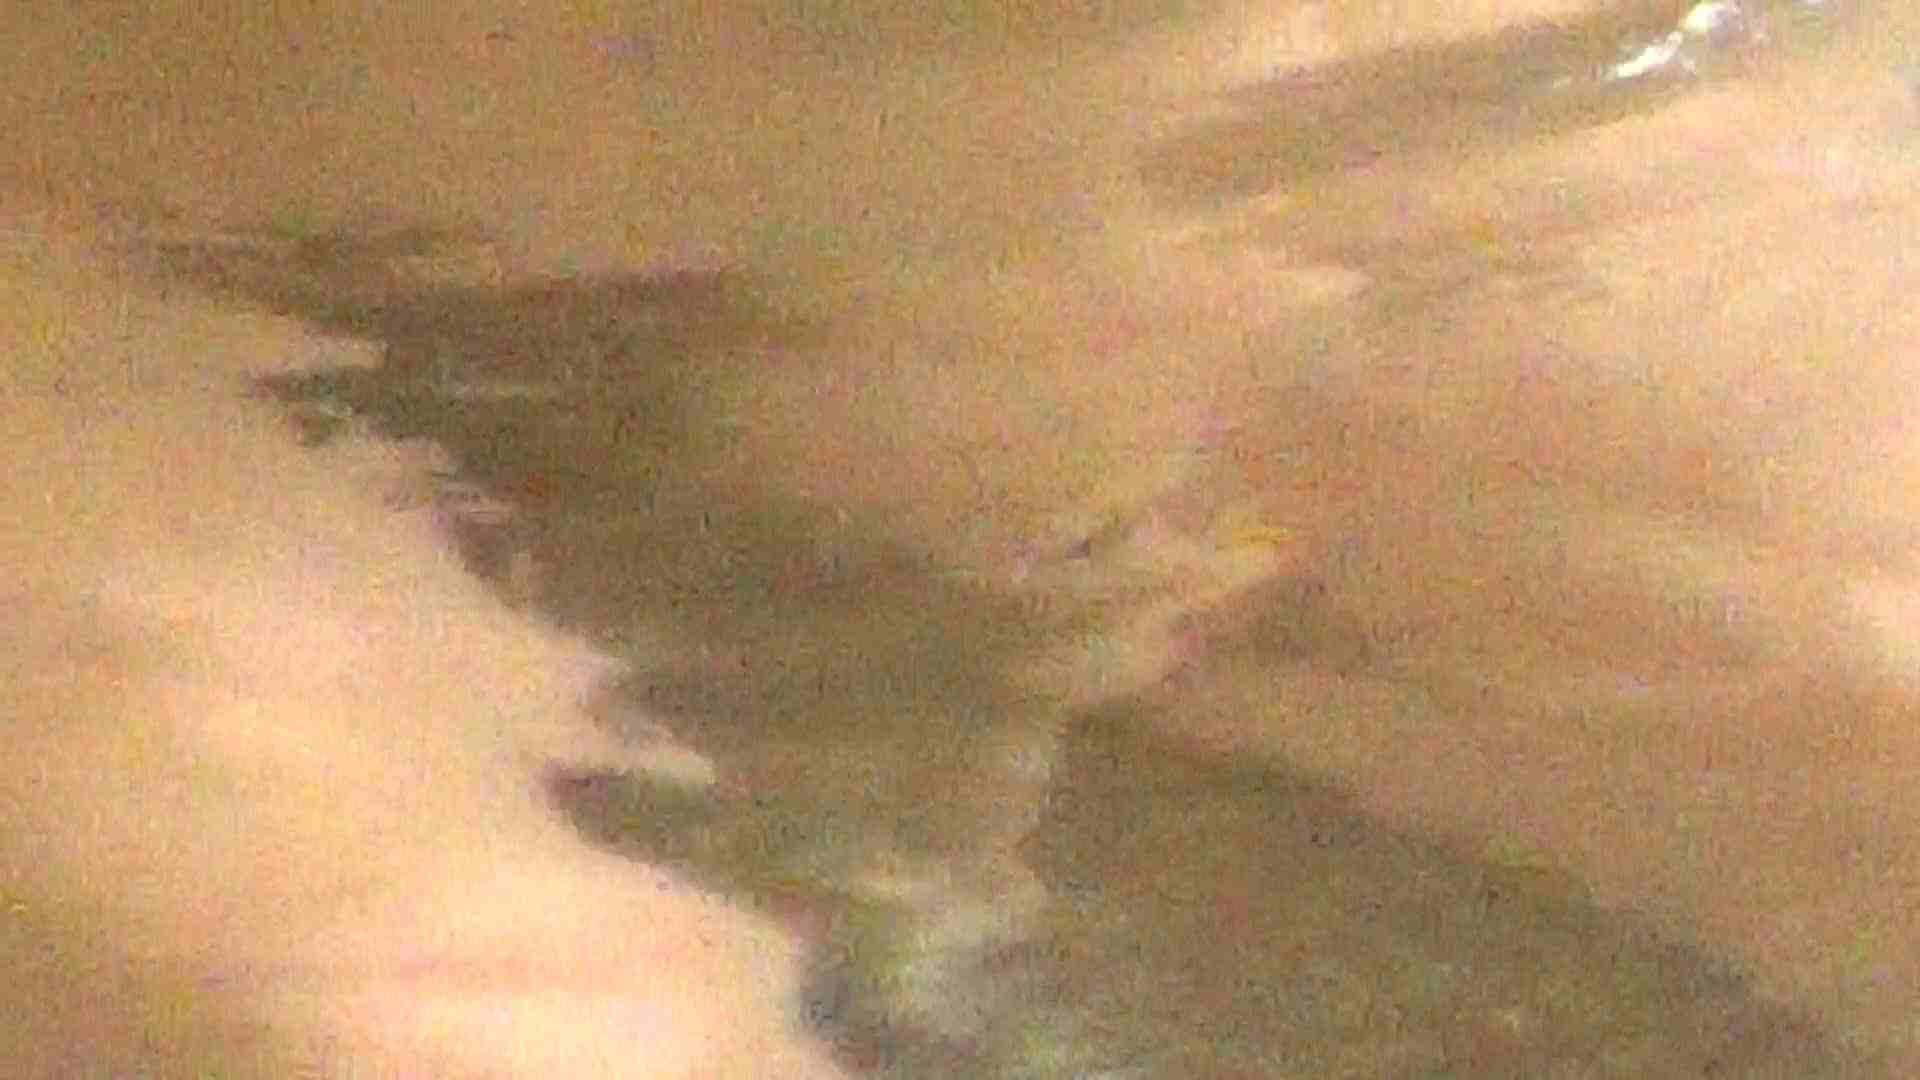 Aquaな露天風呂Vol.244 HなOL | 露天  88pic 84